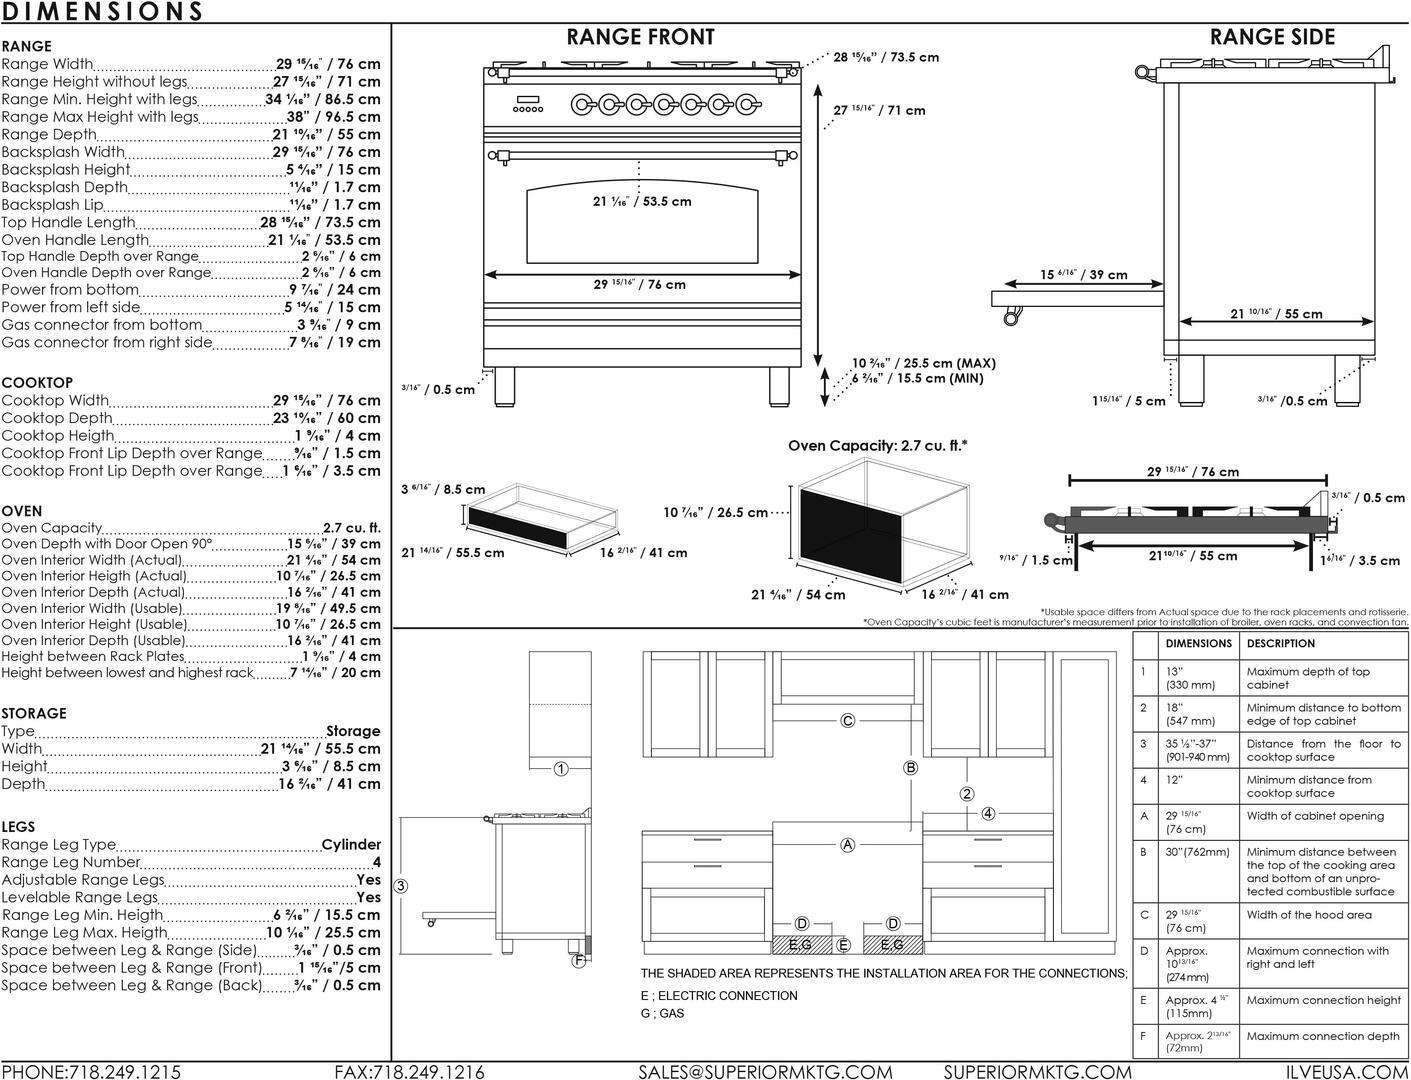 Ilve Professional Plus UPW76DVGGB Freestanding Gas Range , UPW76DV Dimensions Guide